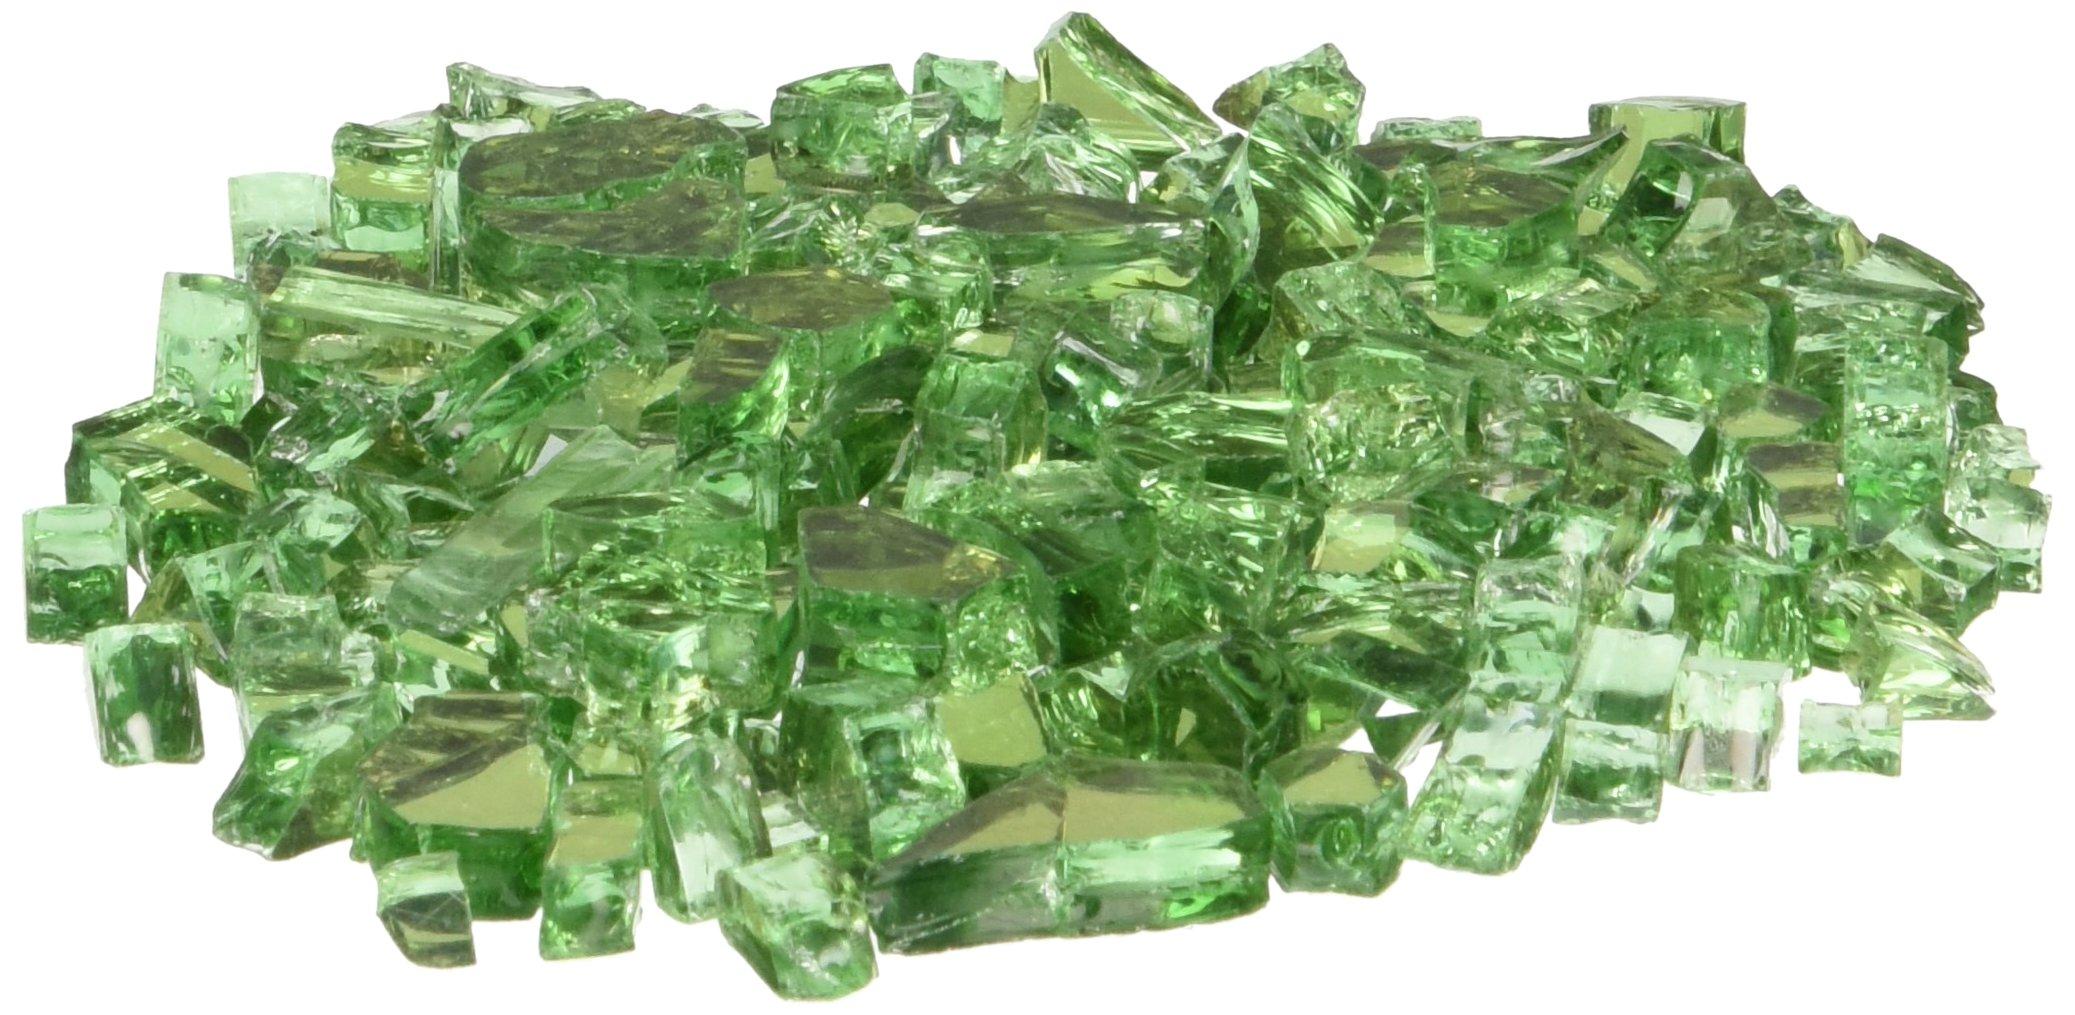 AZ Patio Firepit Reflective Glass, 20 lb, Green by Hiland